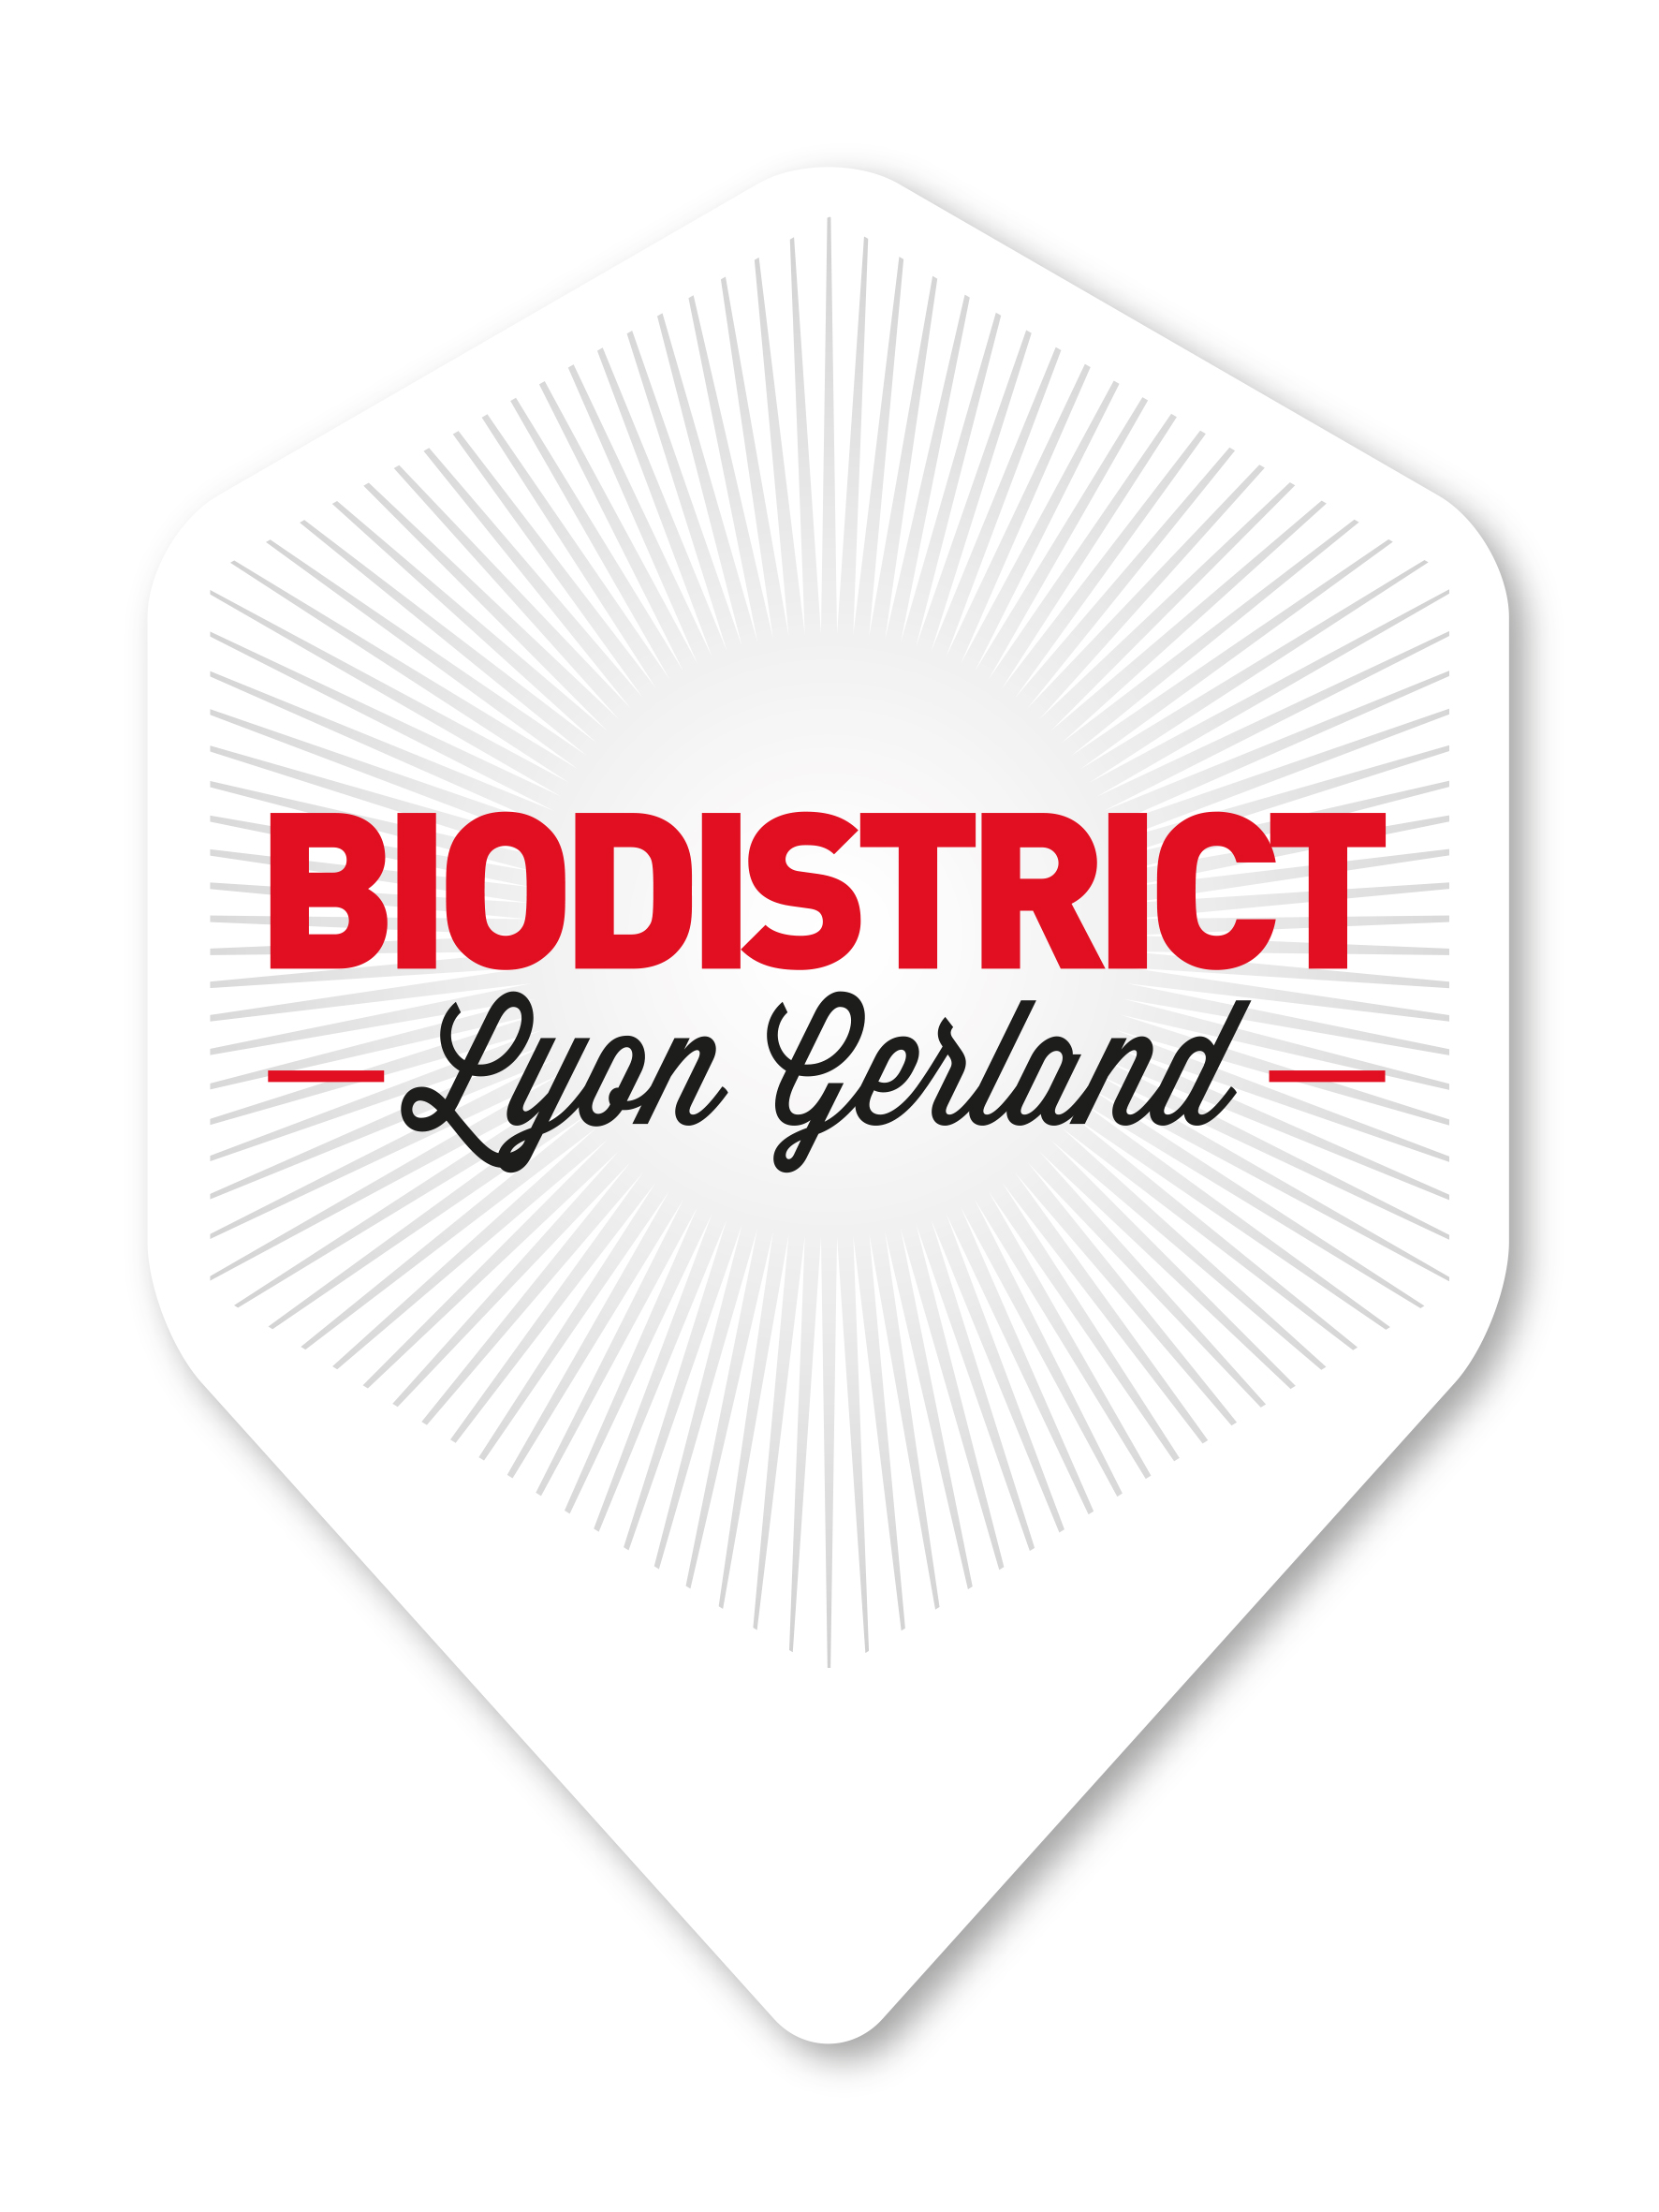 Biodistrict Lyon-Gerland - EKNO